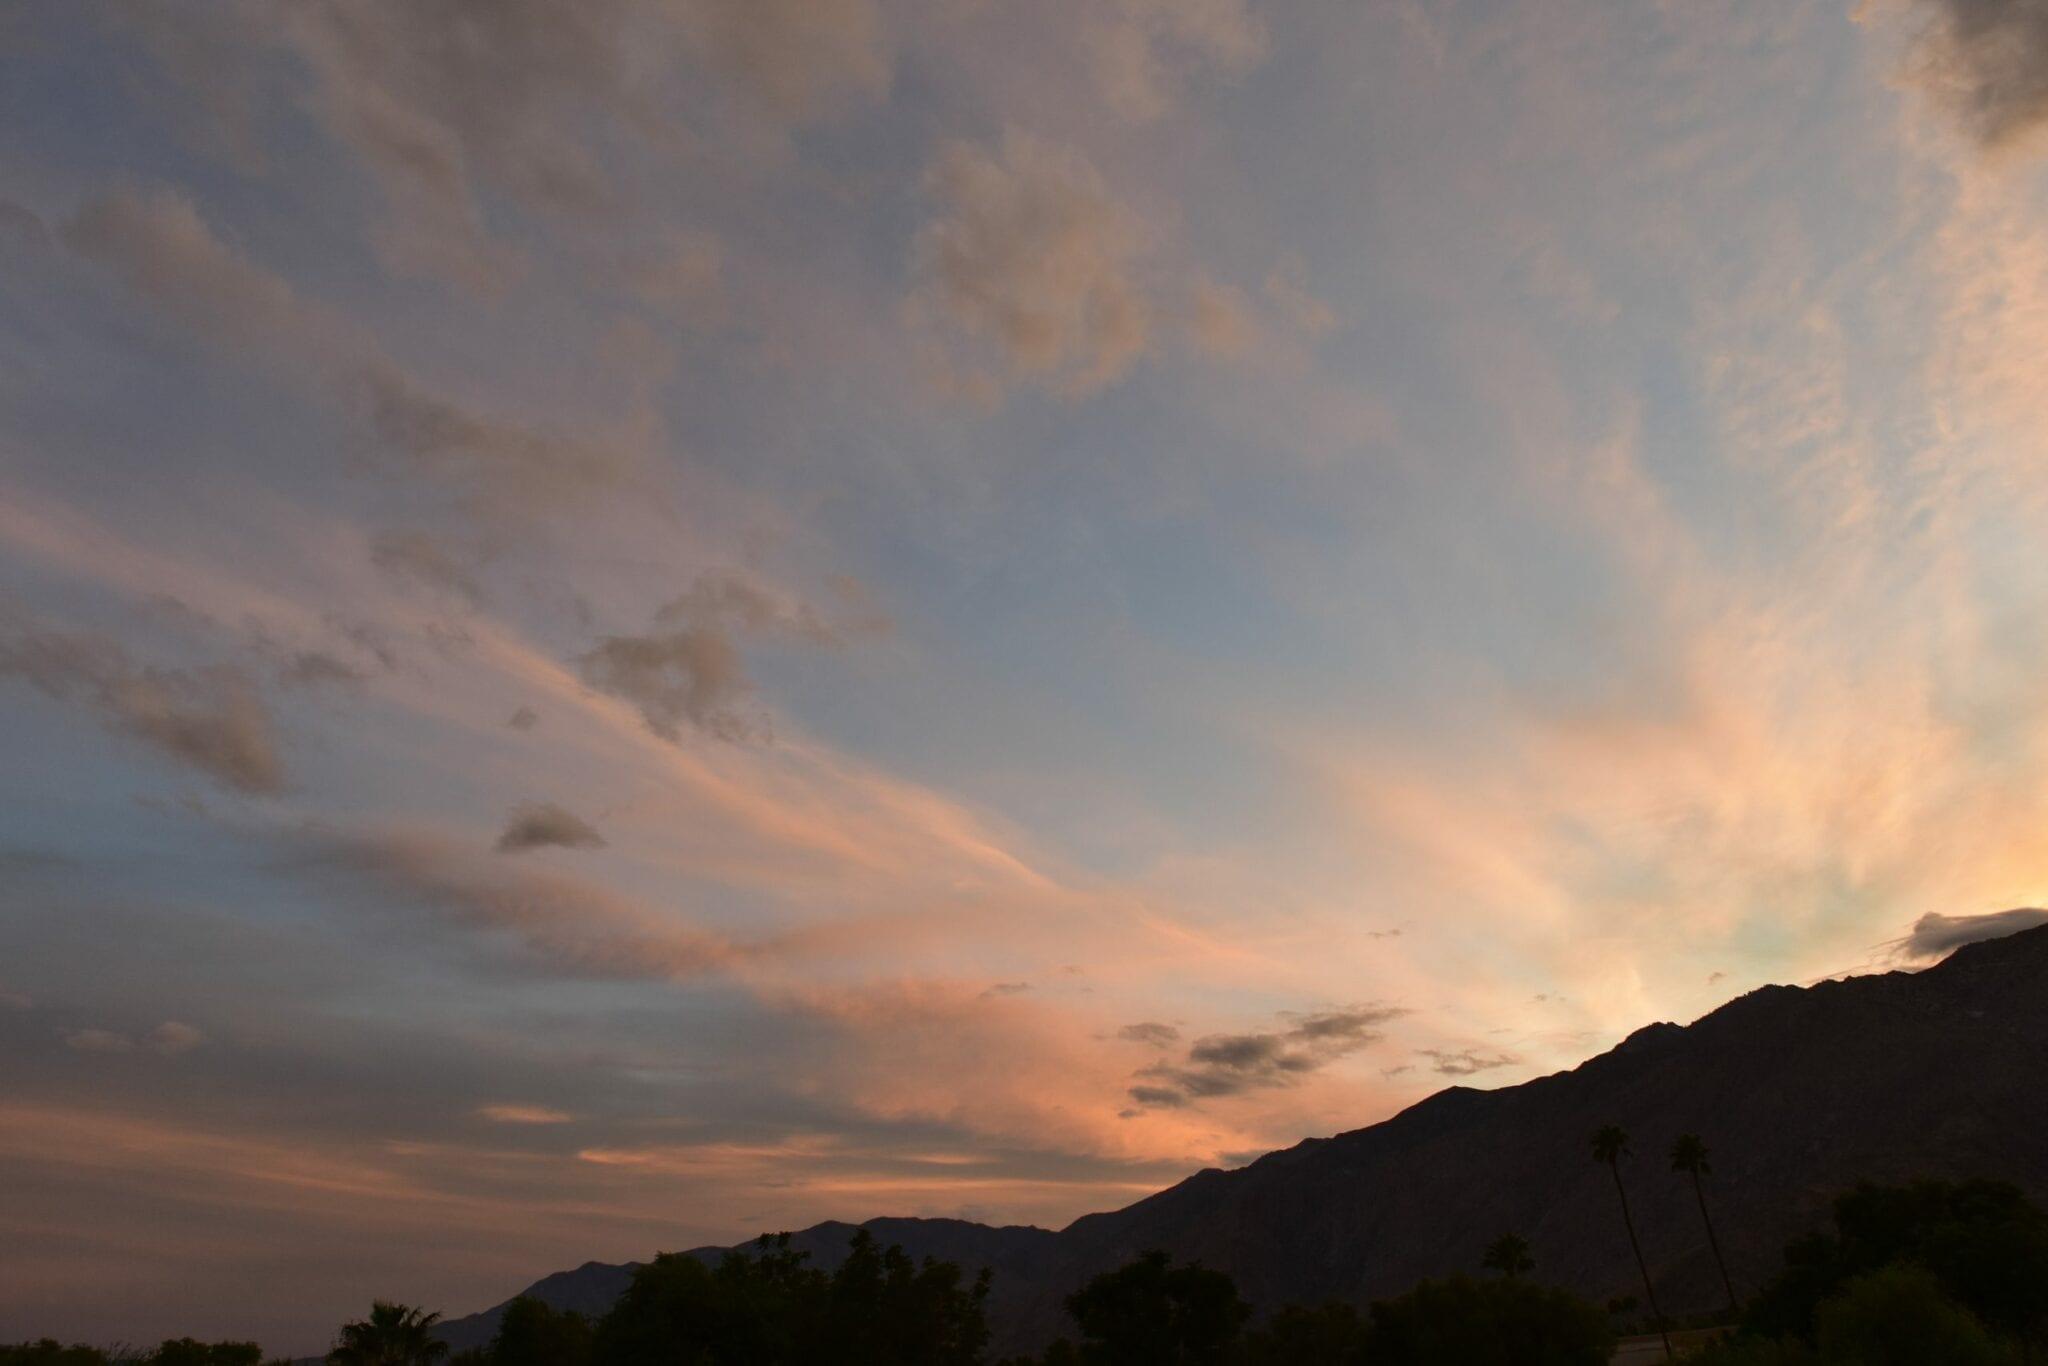 Cloudforms